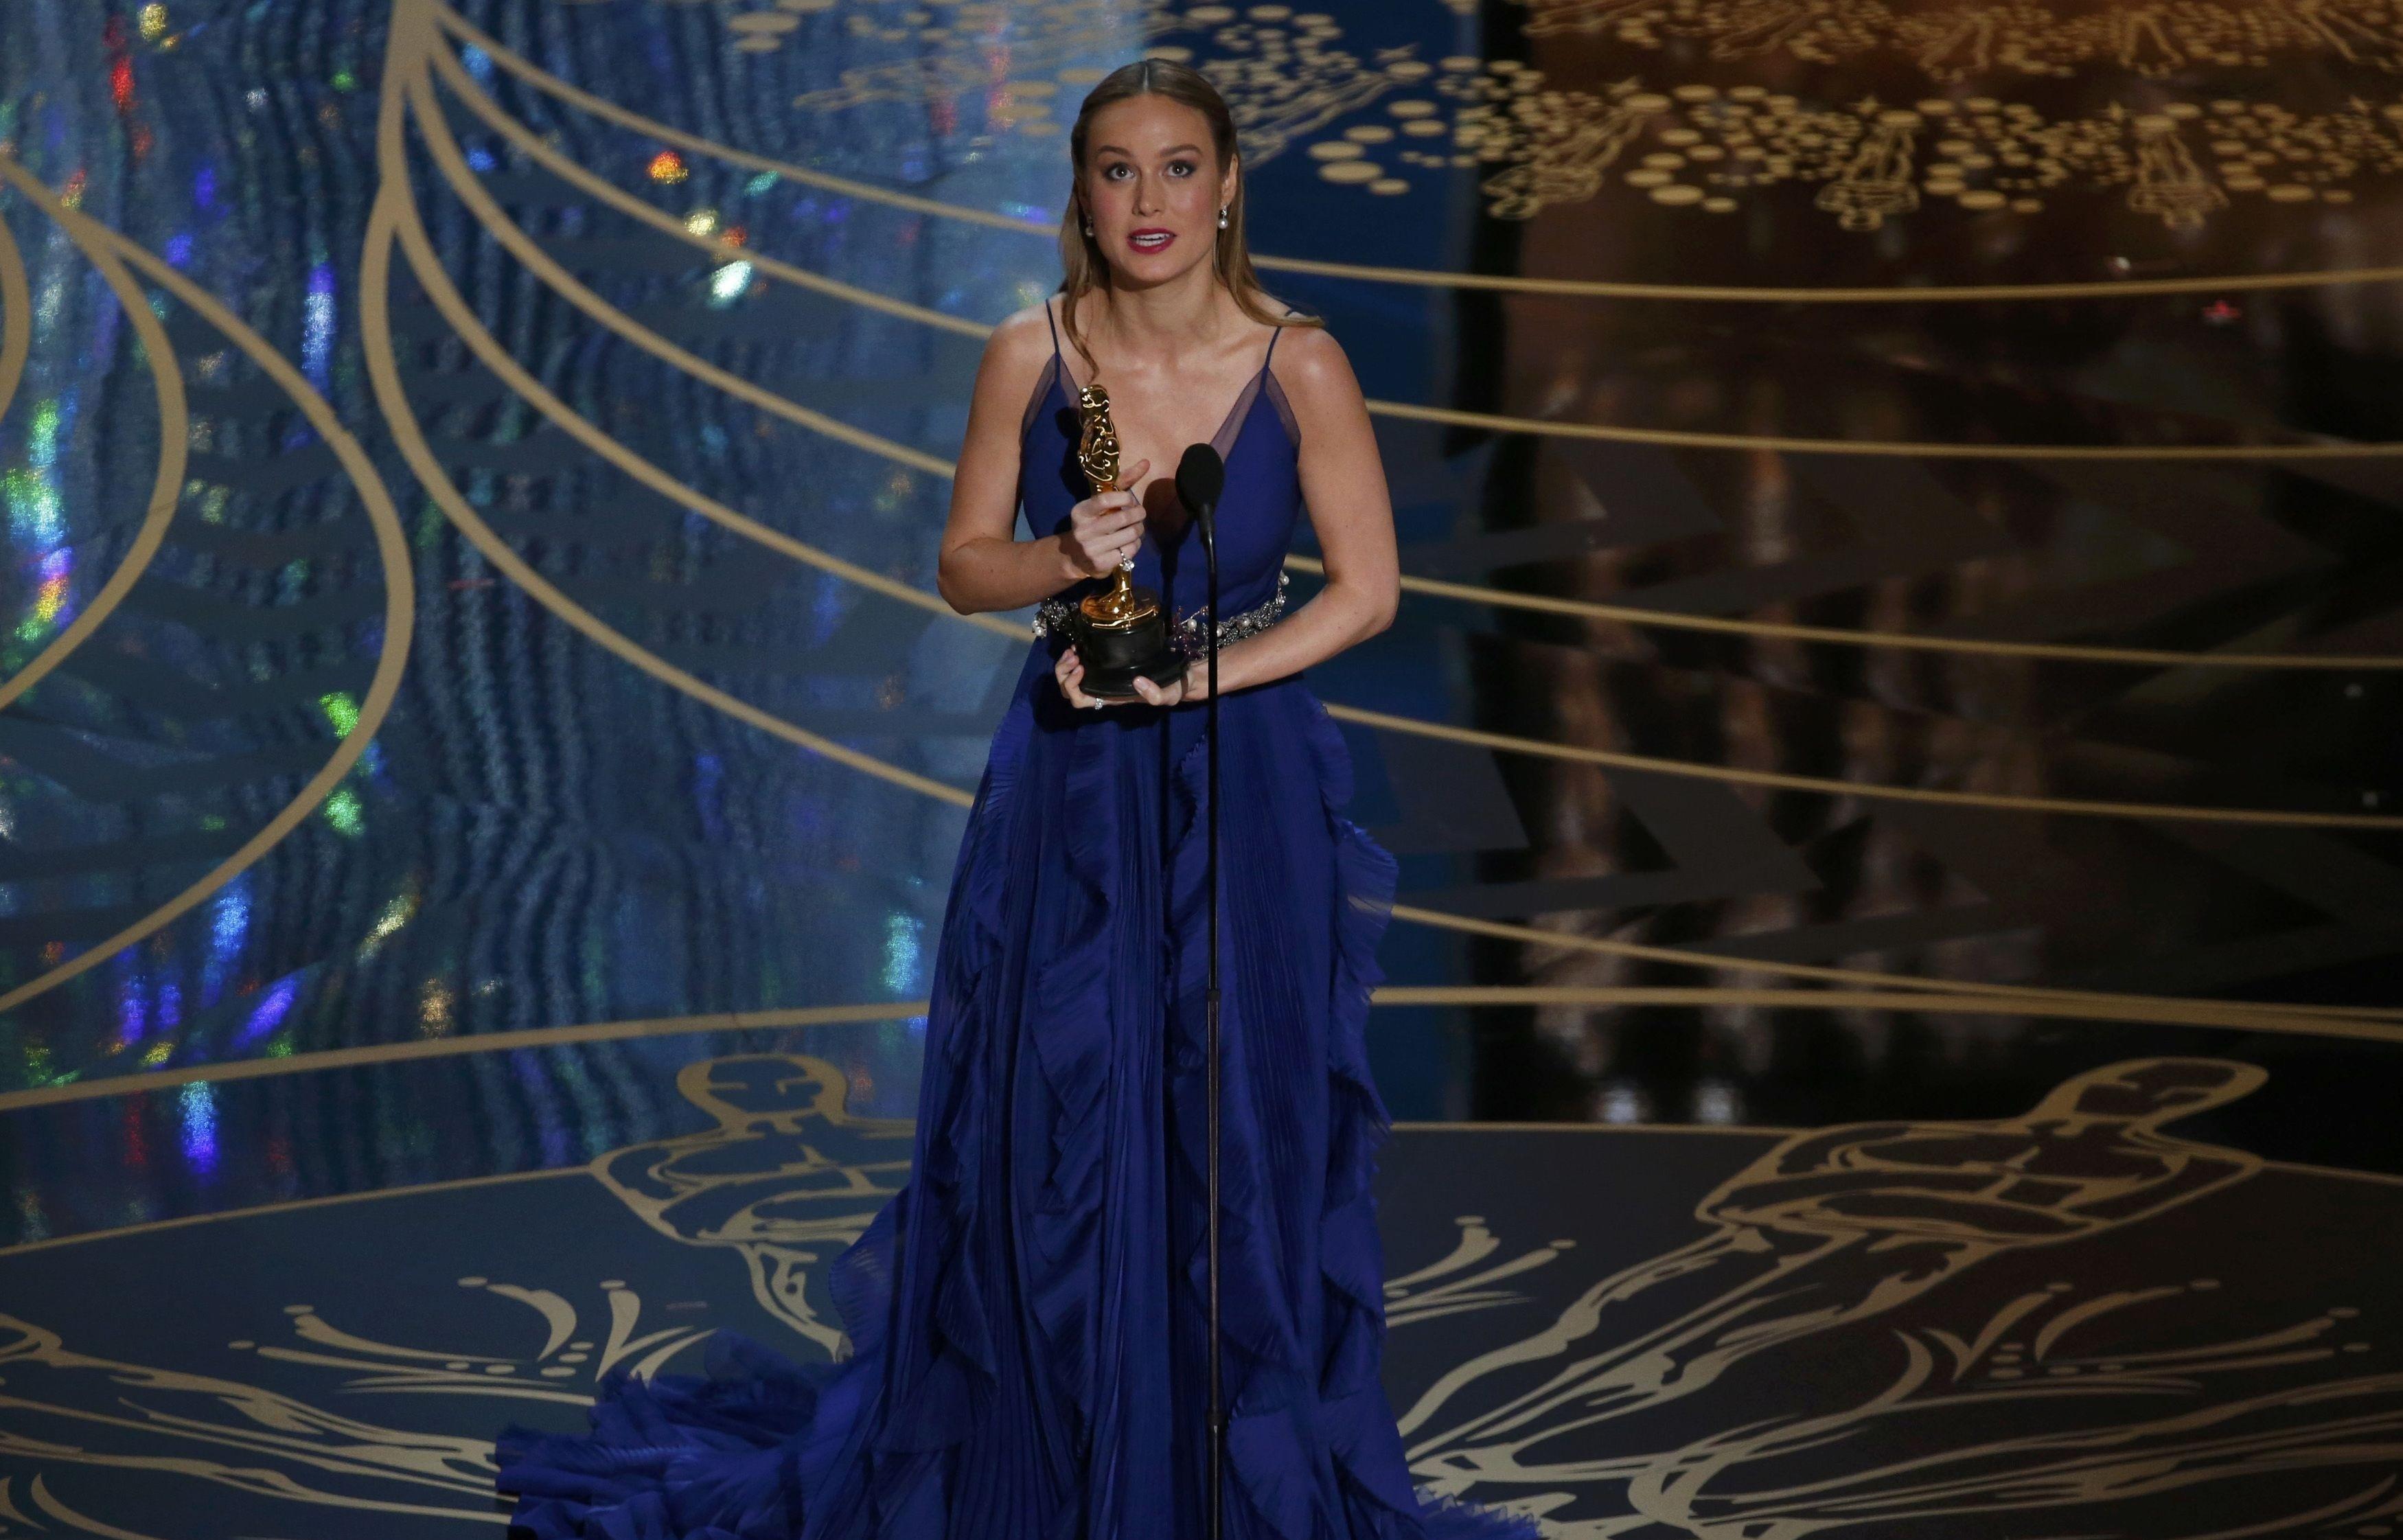 Wallpaper Brie Larson Oscar 2016 Red Carpet Most